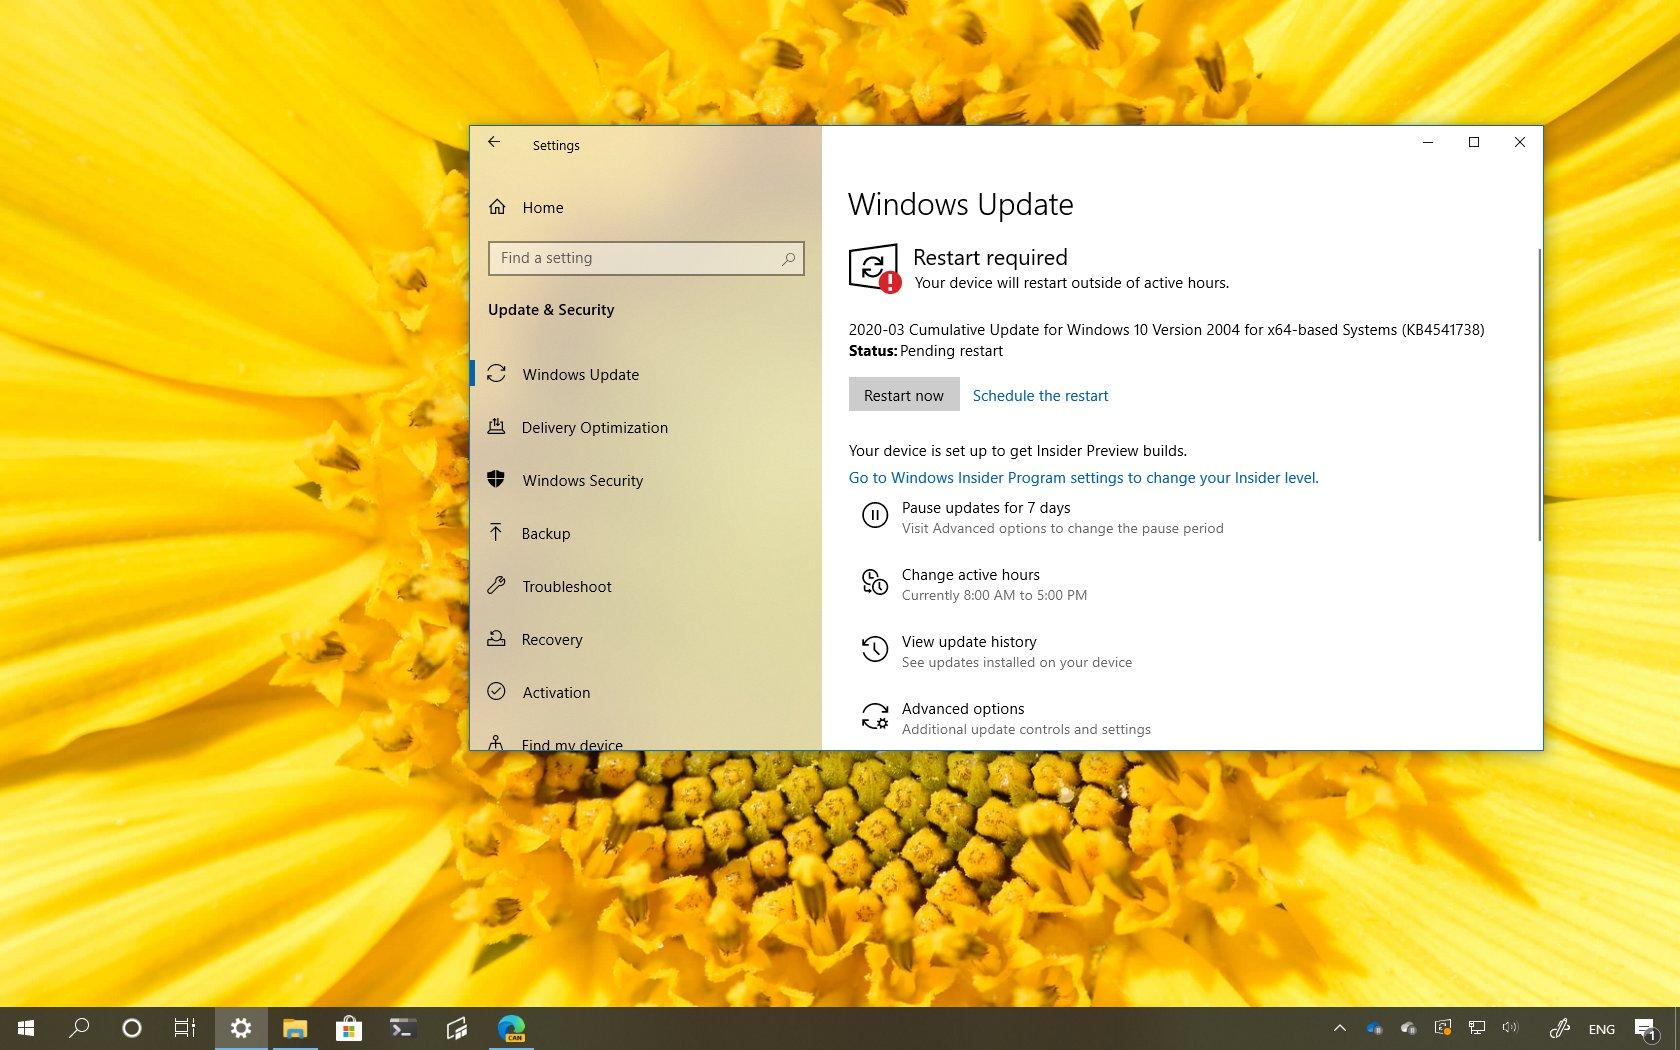 Windows 10 build 19041.153, update KB4541738